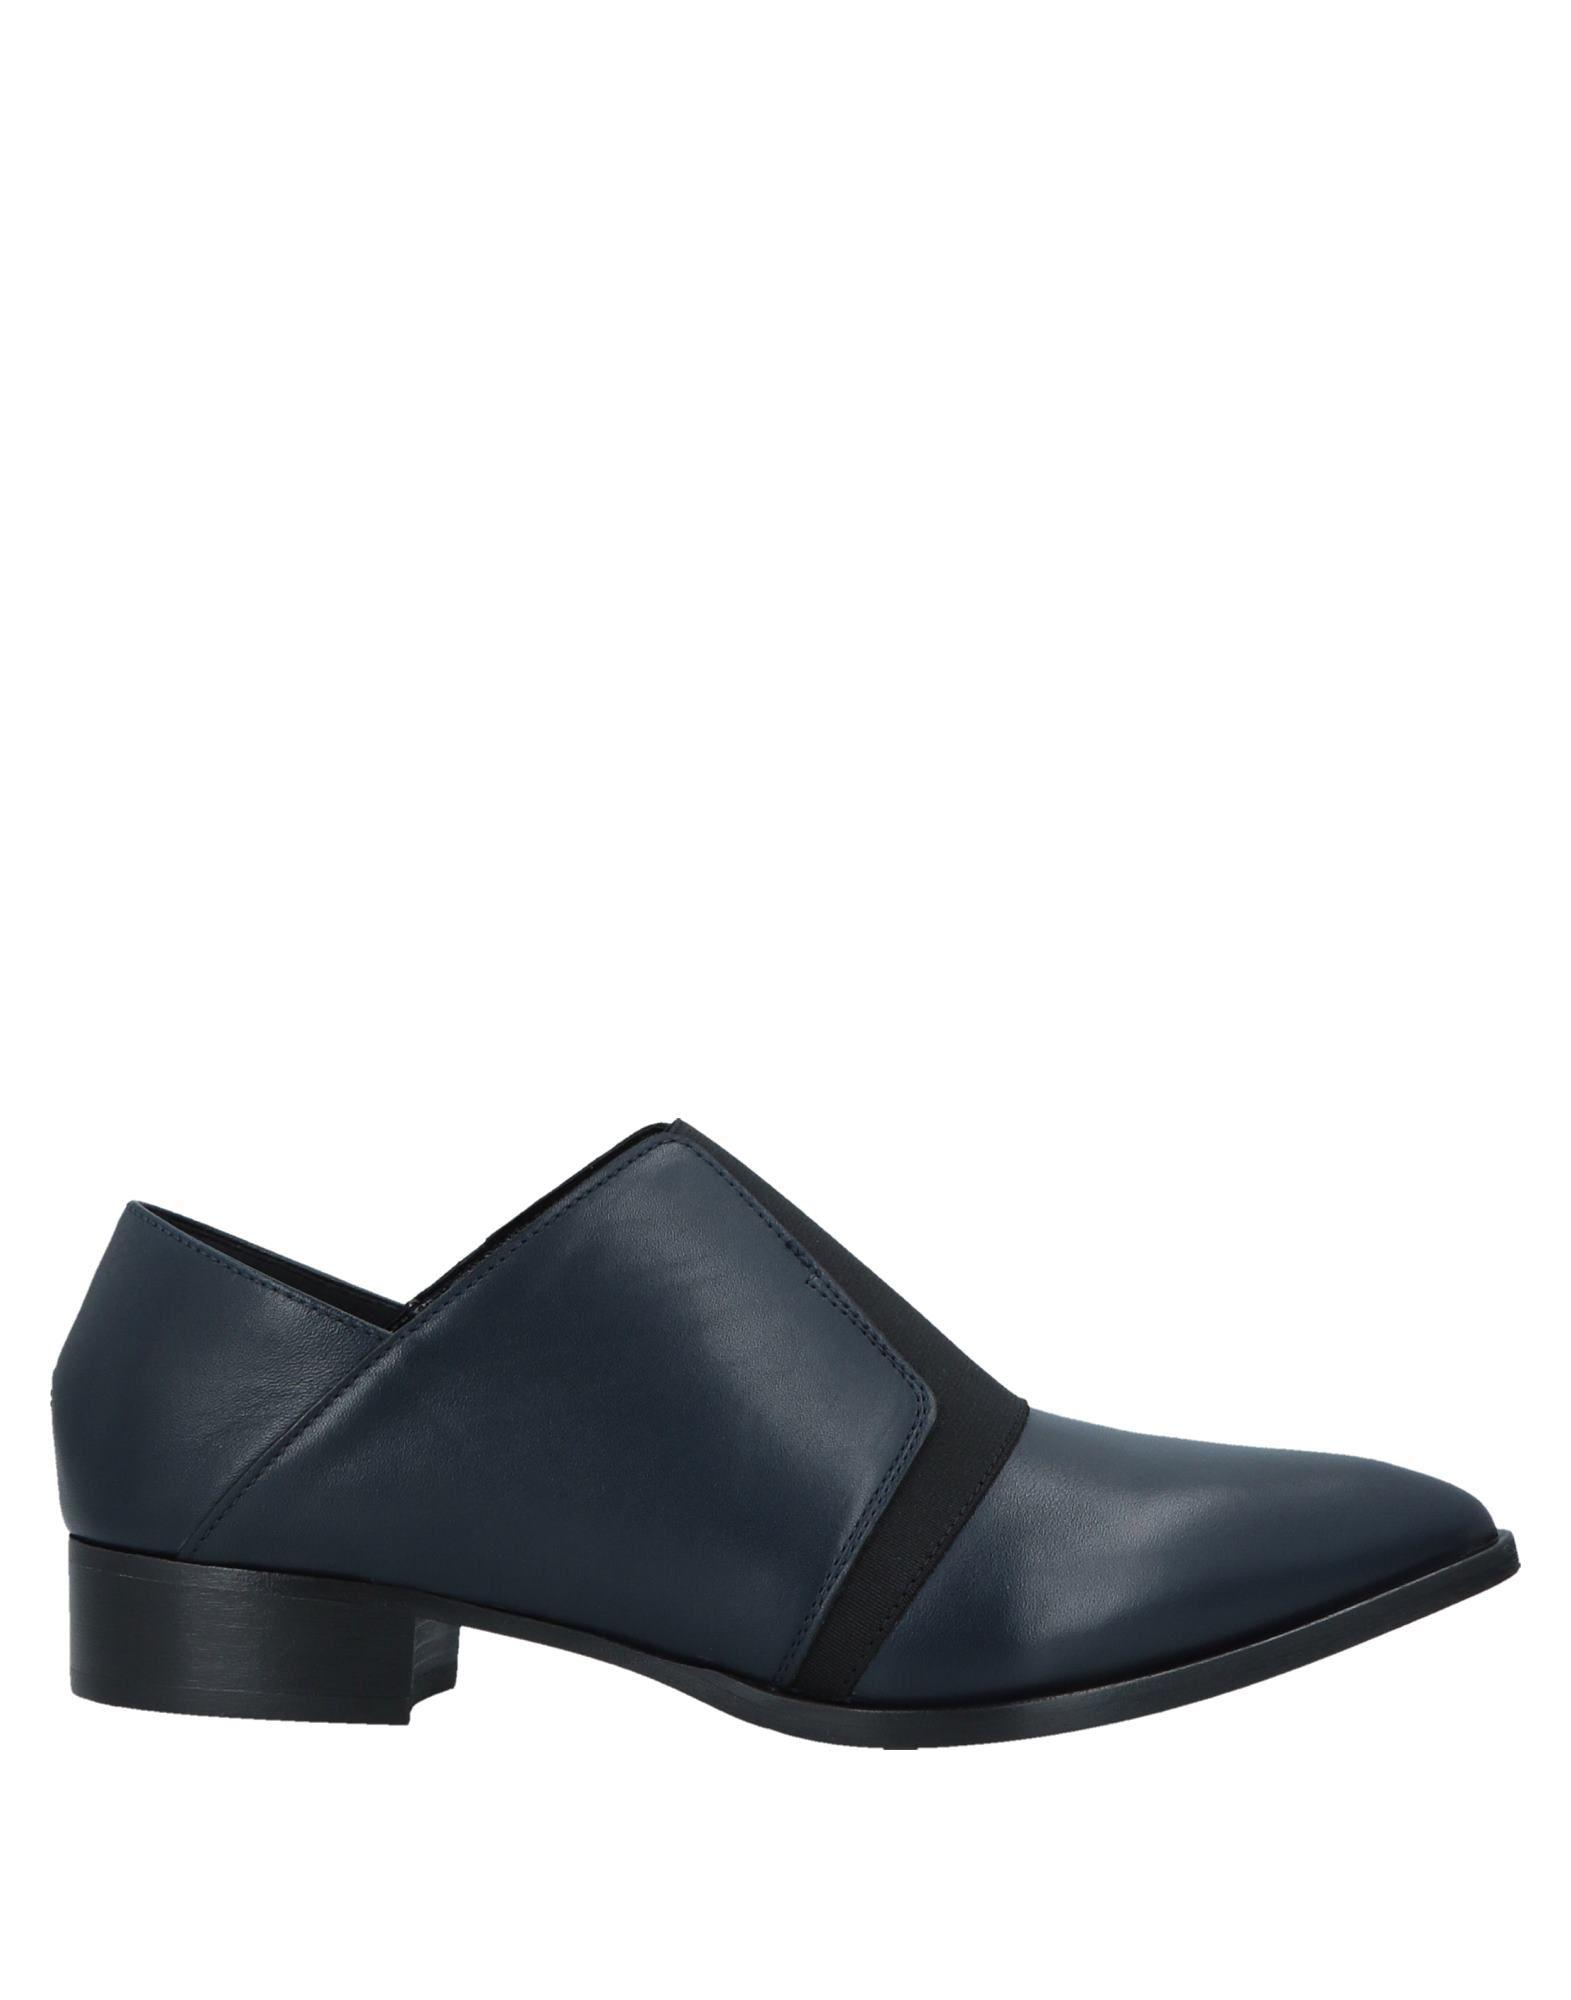 Alberto Fermani Boots BOOTIES